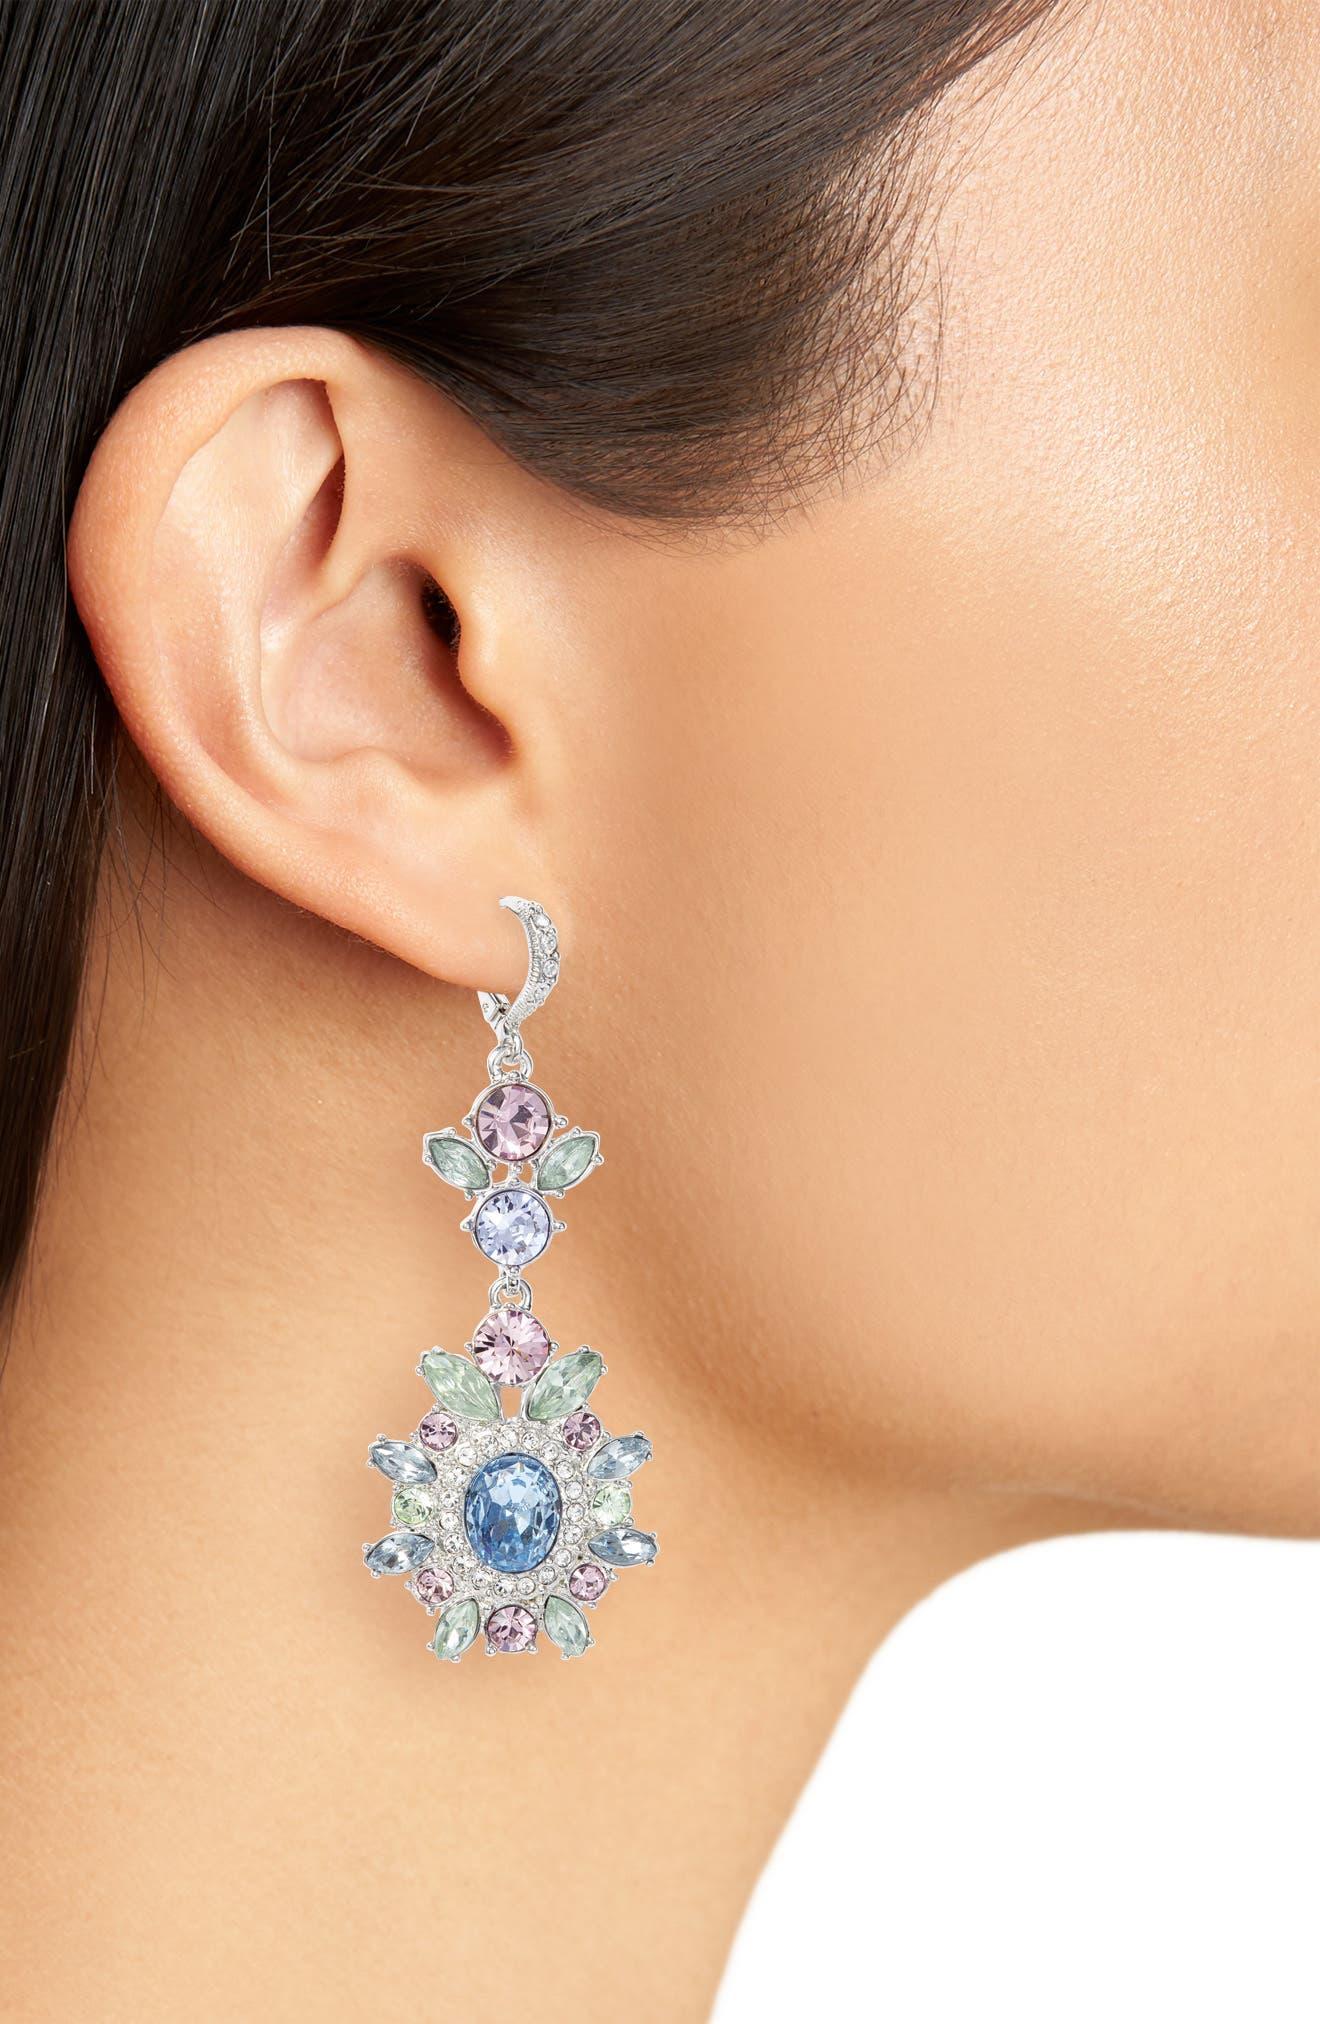 Large Double Drop Crystal Earrings,                             Alternate thumbnail 2, color,                             Rhodium/ Pastel Multi